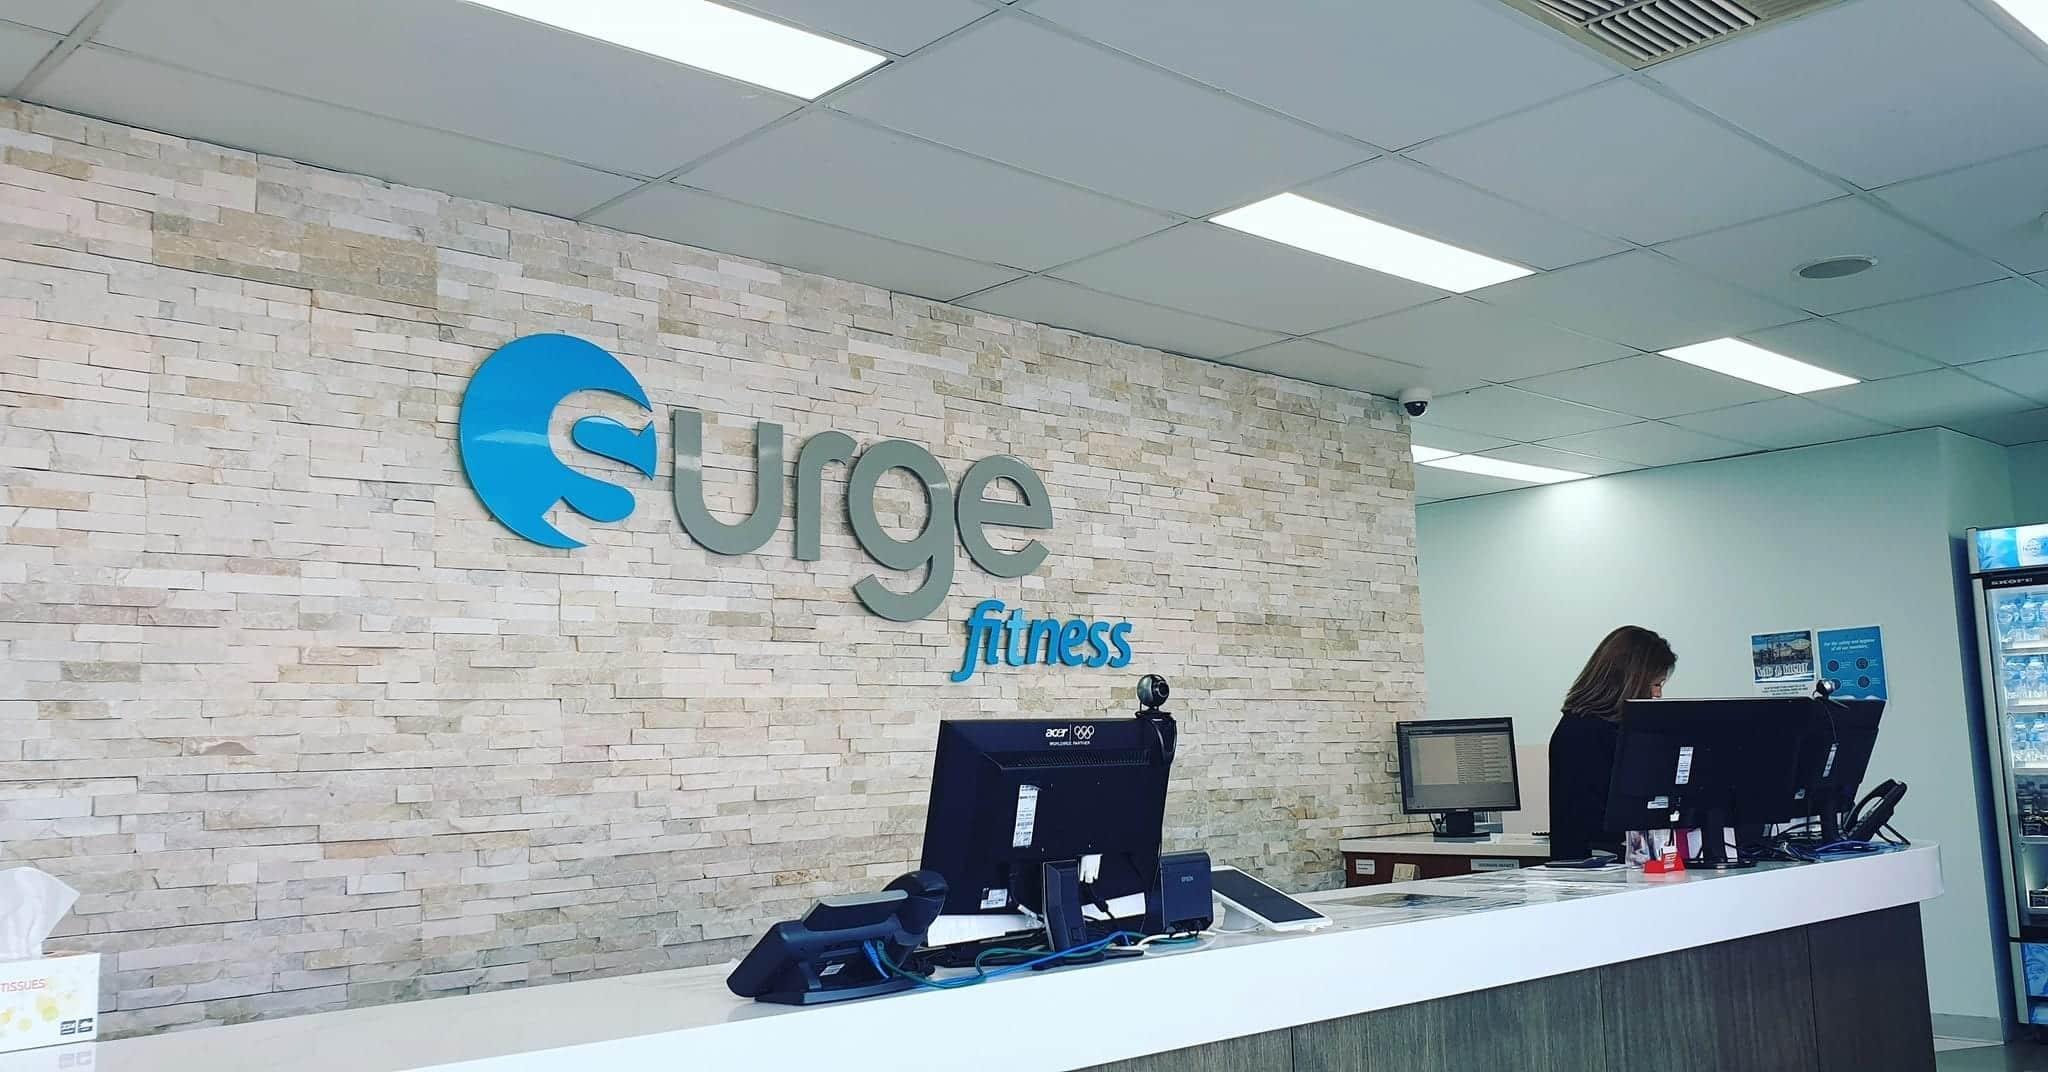 Surge Fitness Clarkson